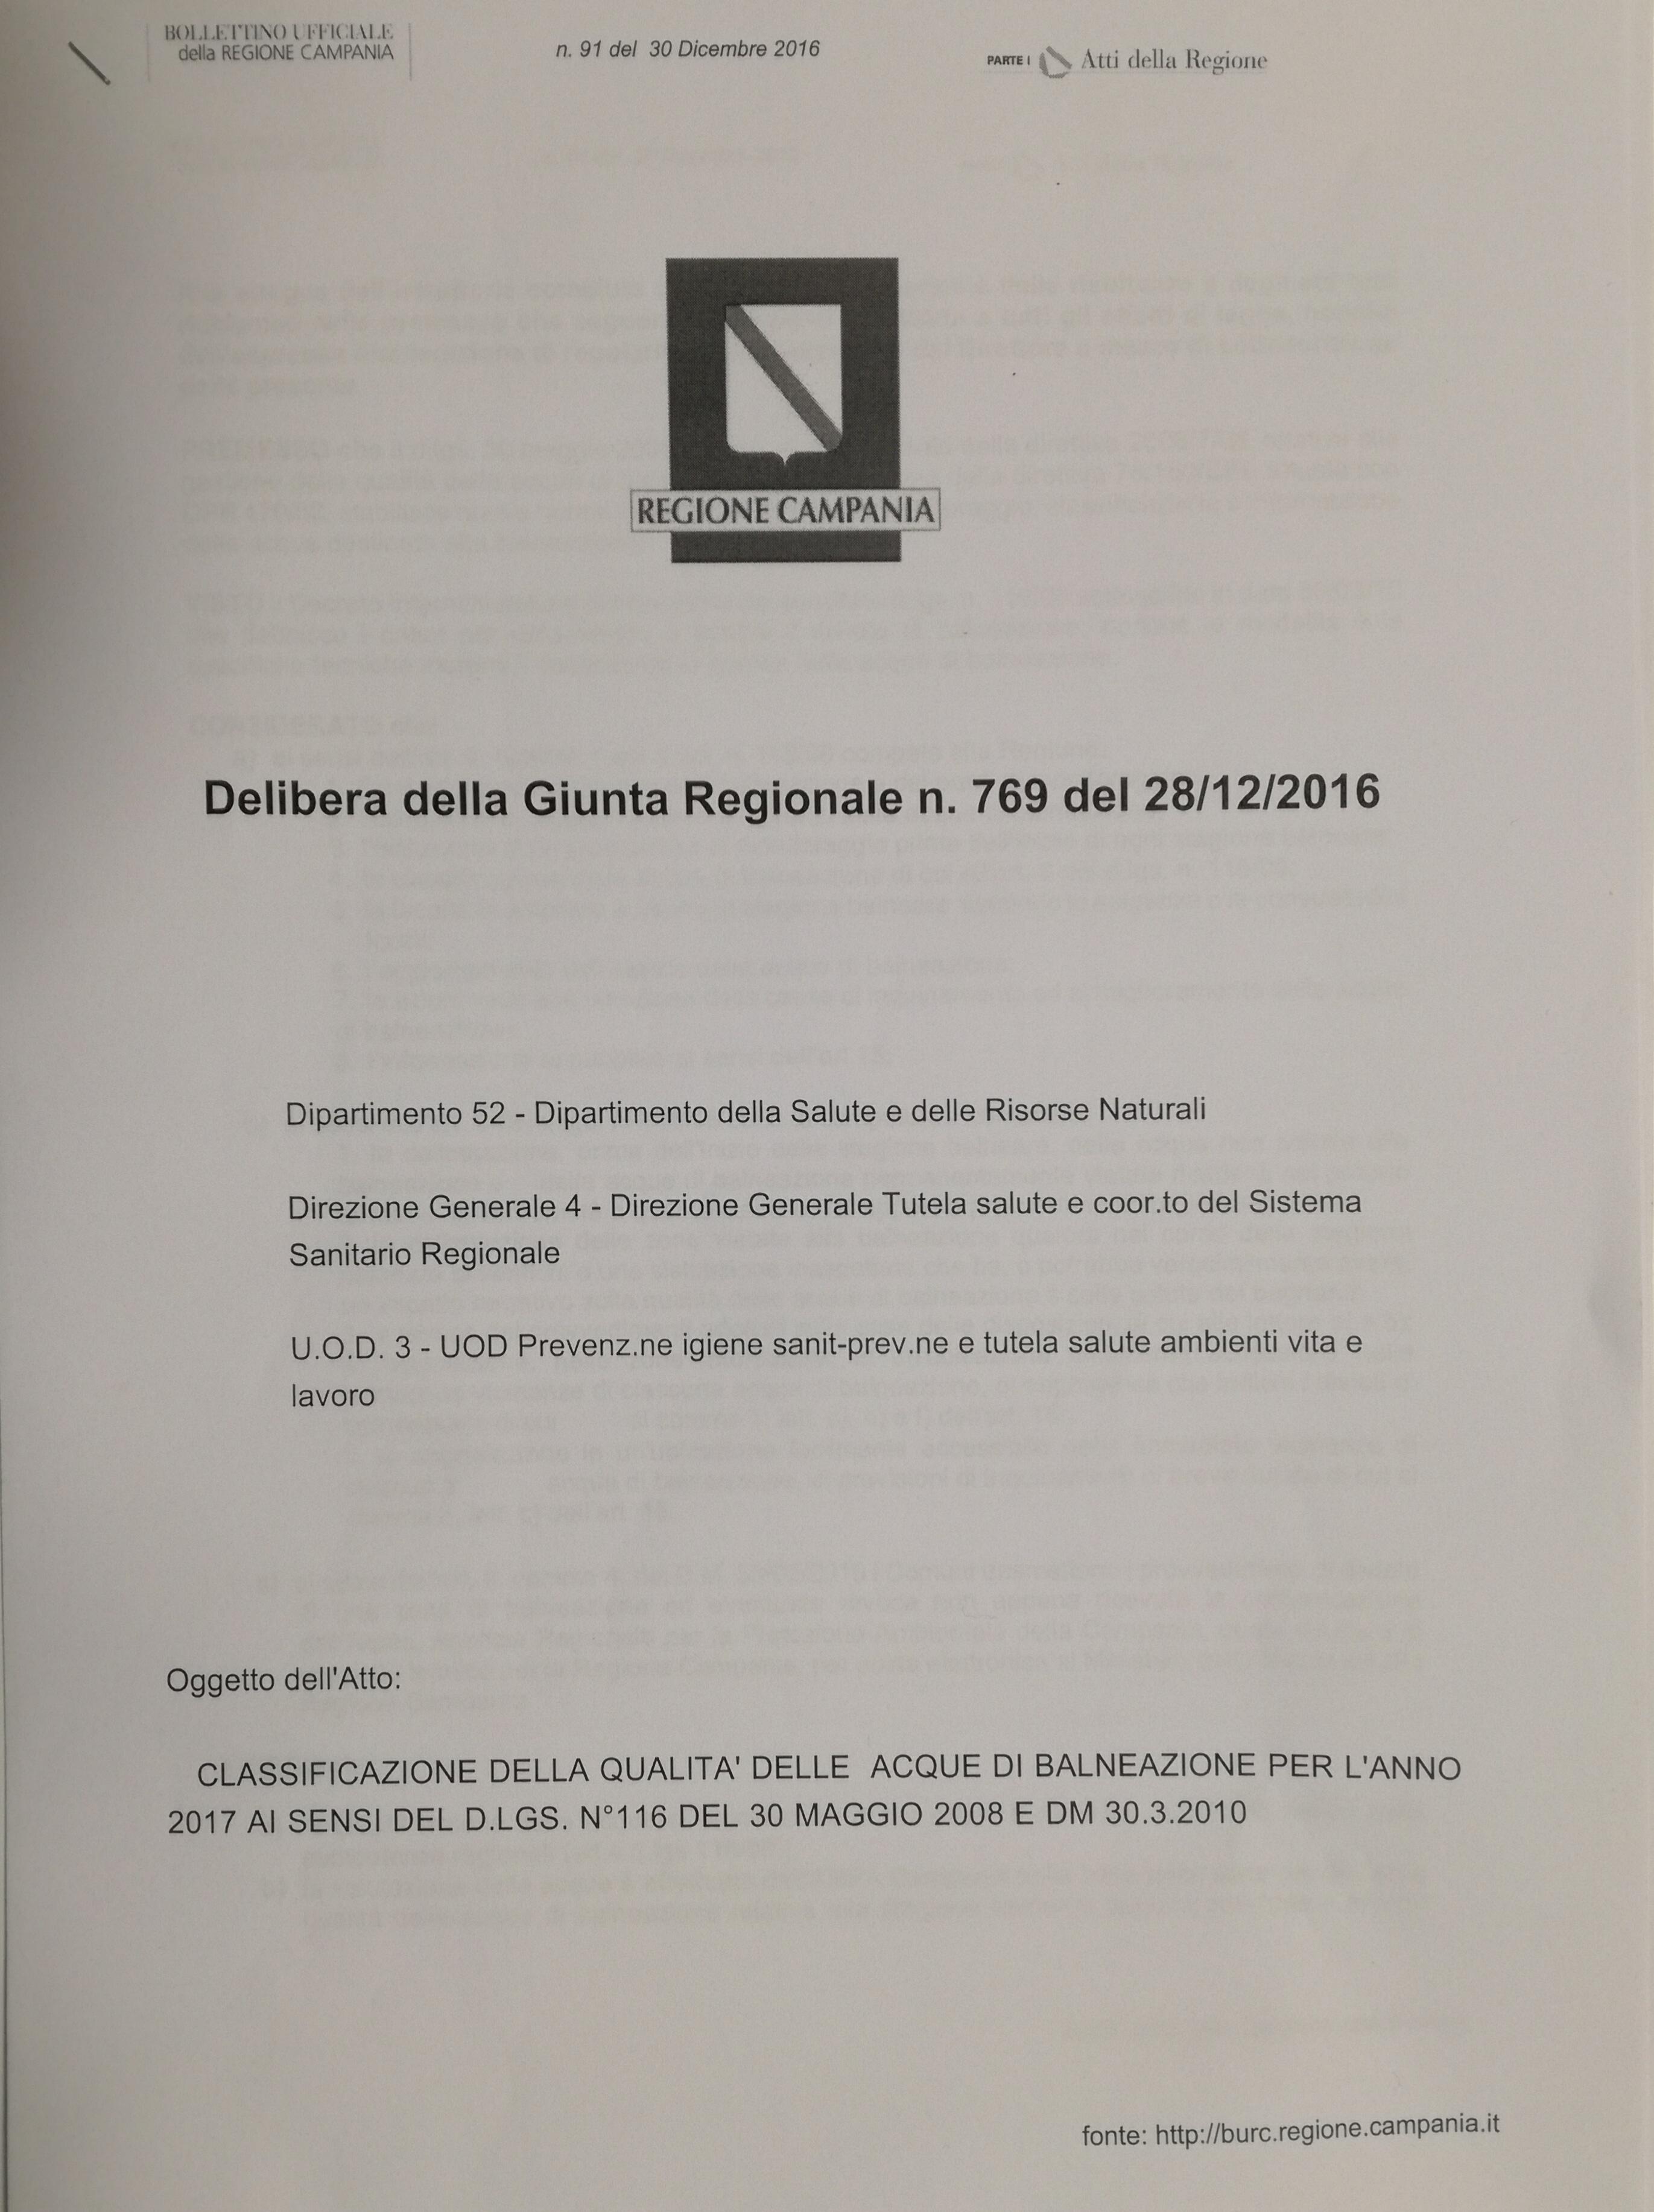 Balneabilitá-Delibera-Giunta Regionale-Campania-769-del-28-12-2016-